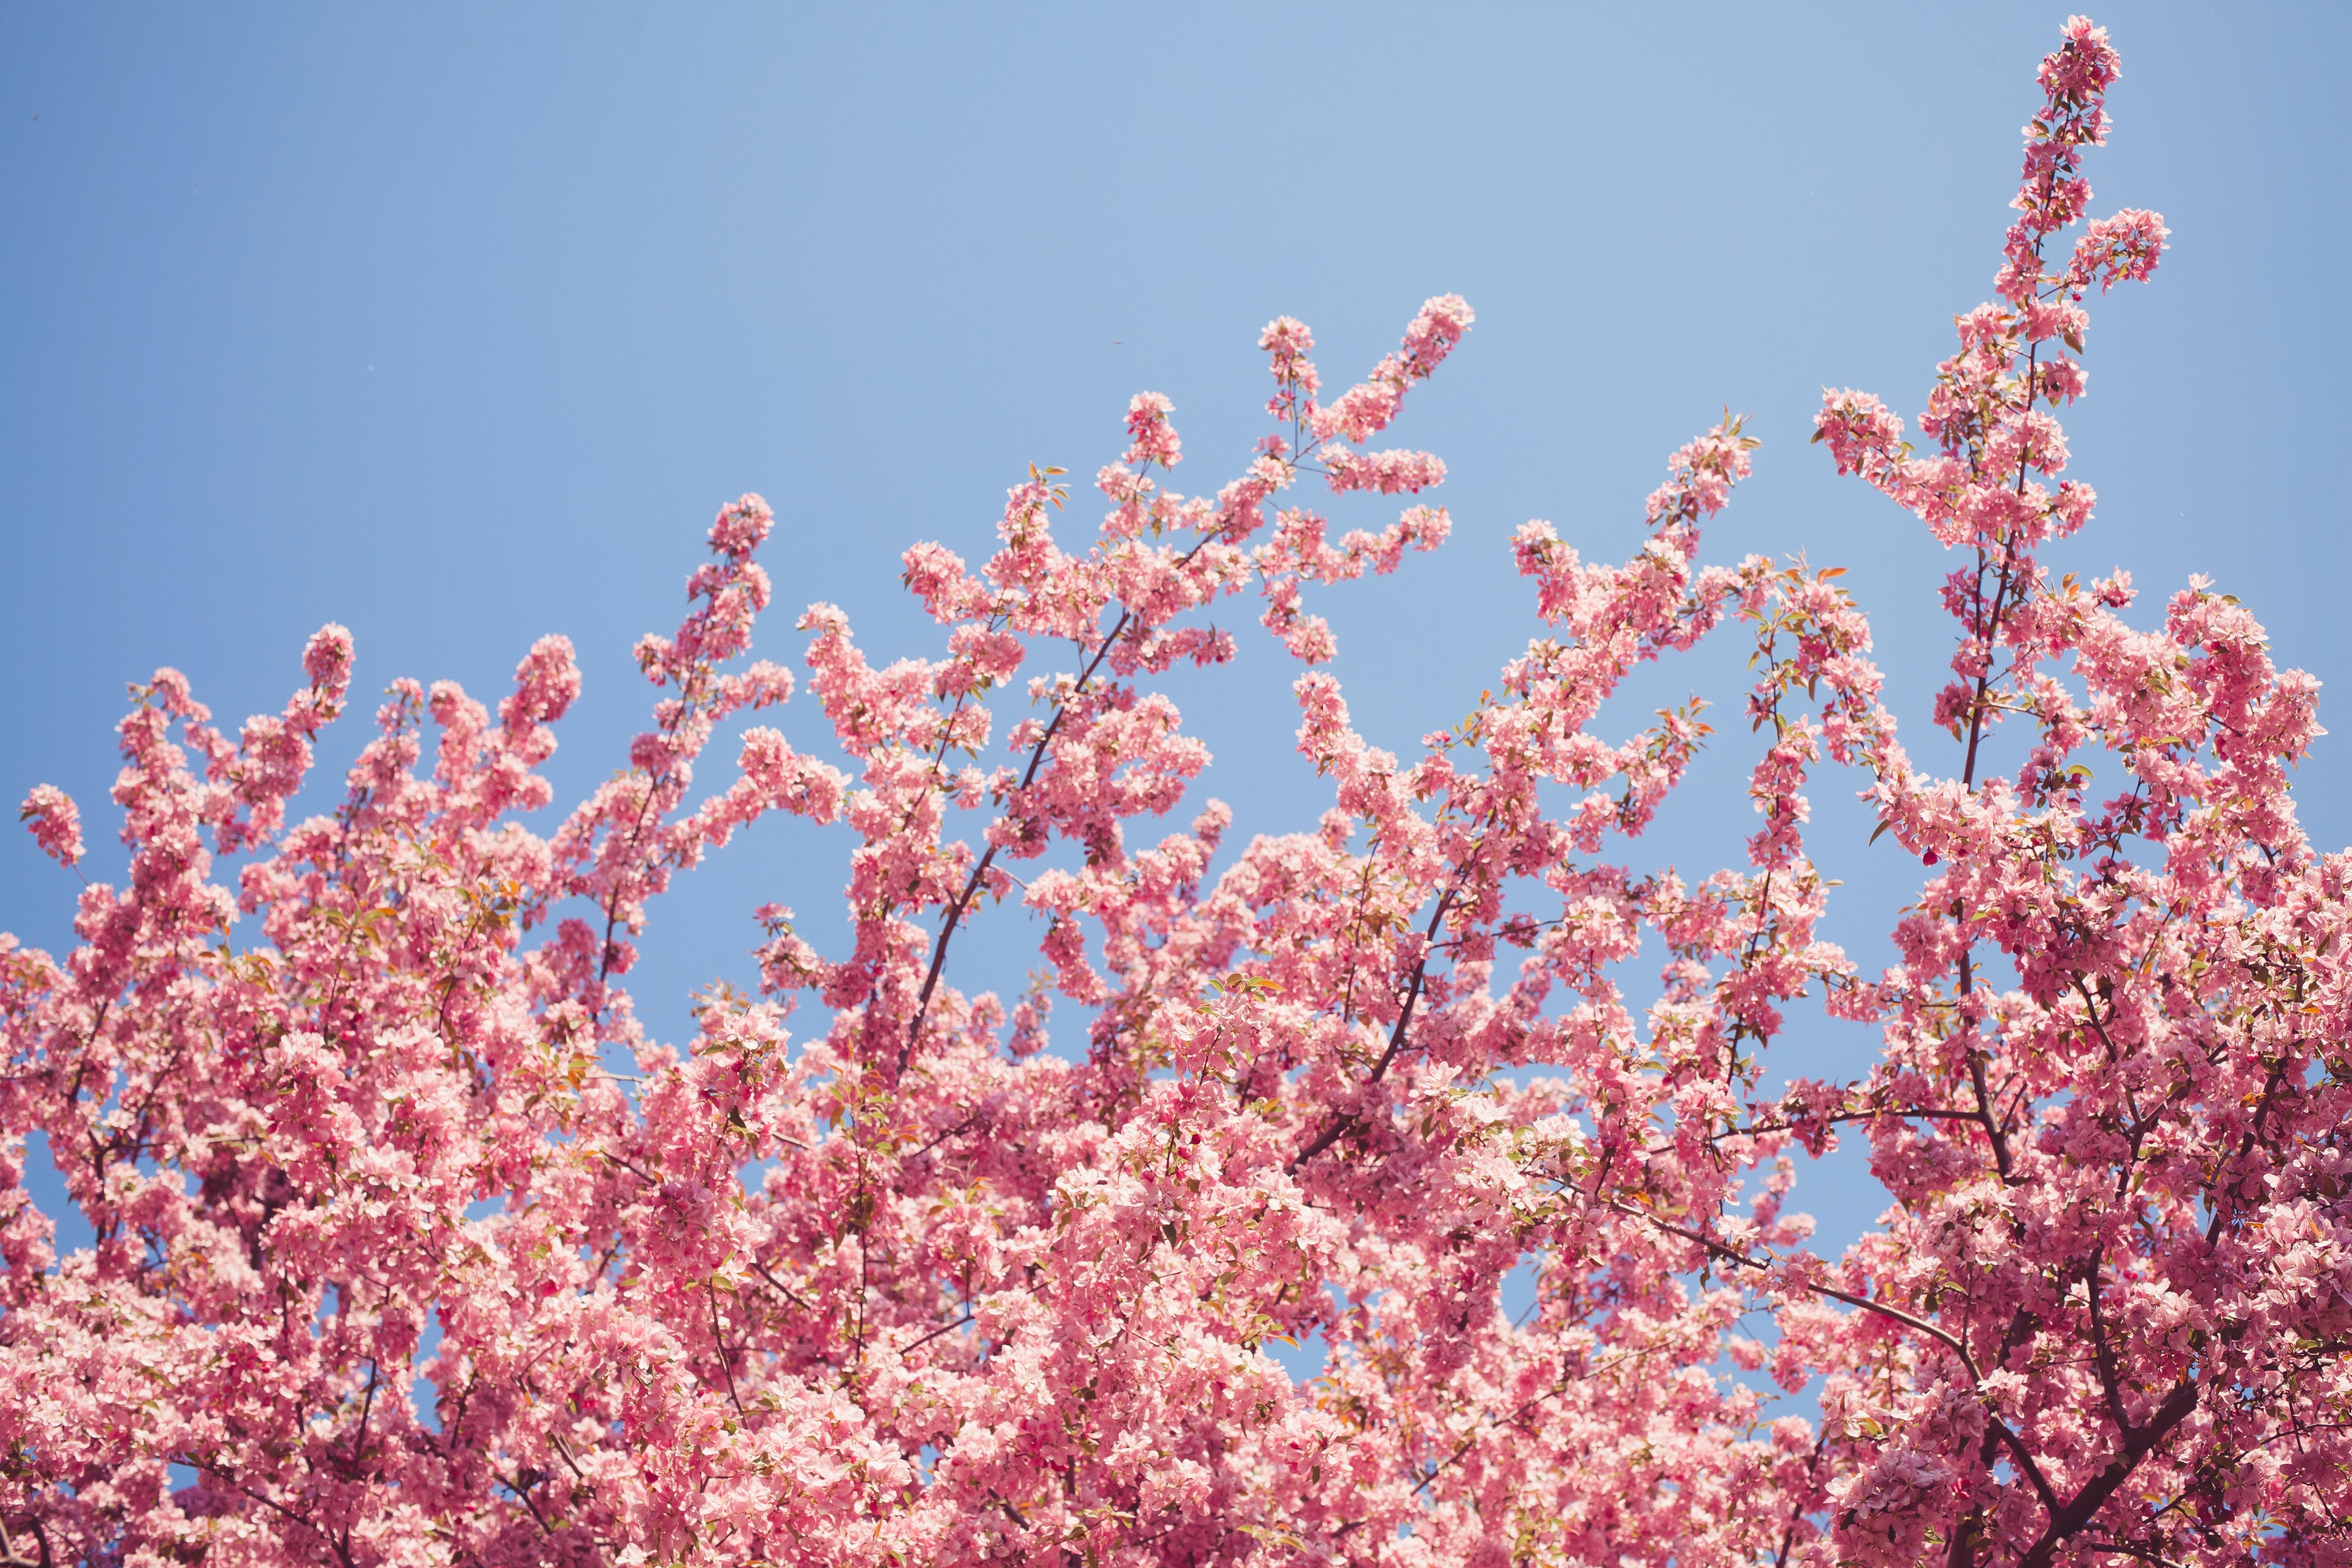 cherry blossom at daytime